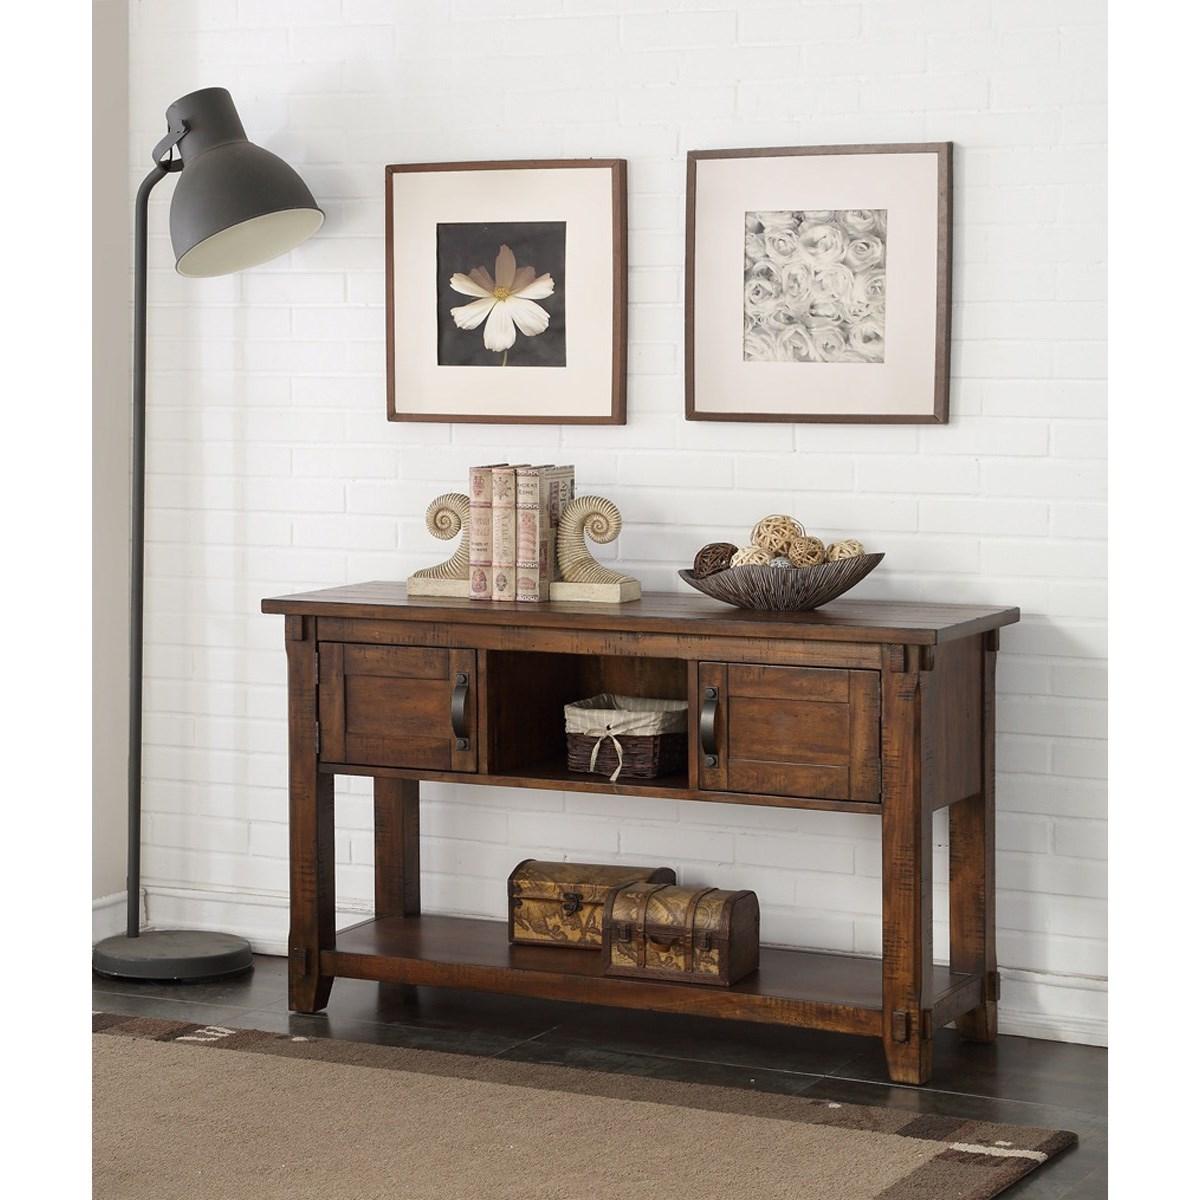 Legends furniture restoration zrst 4300 rustic restoration for Furniture restoration